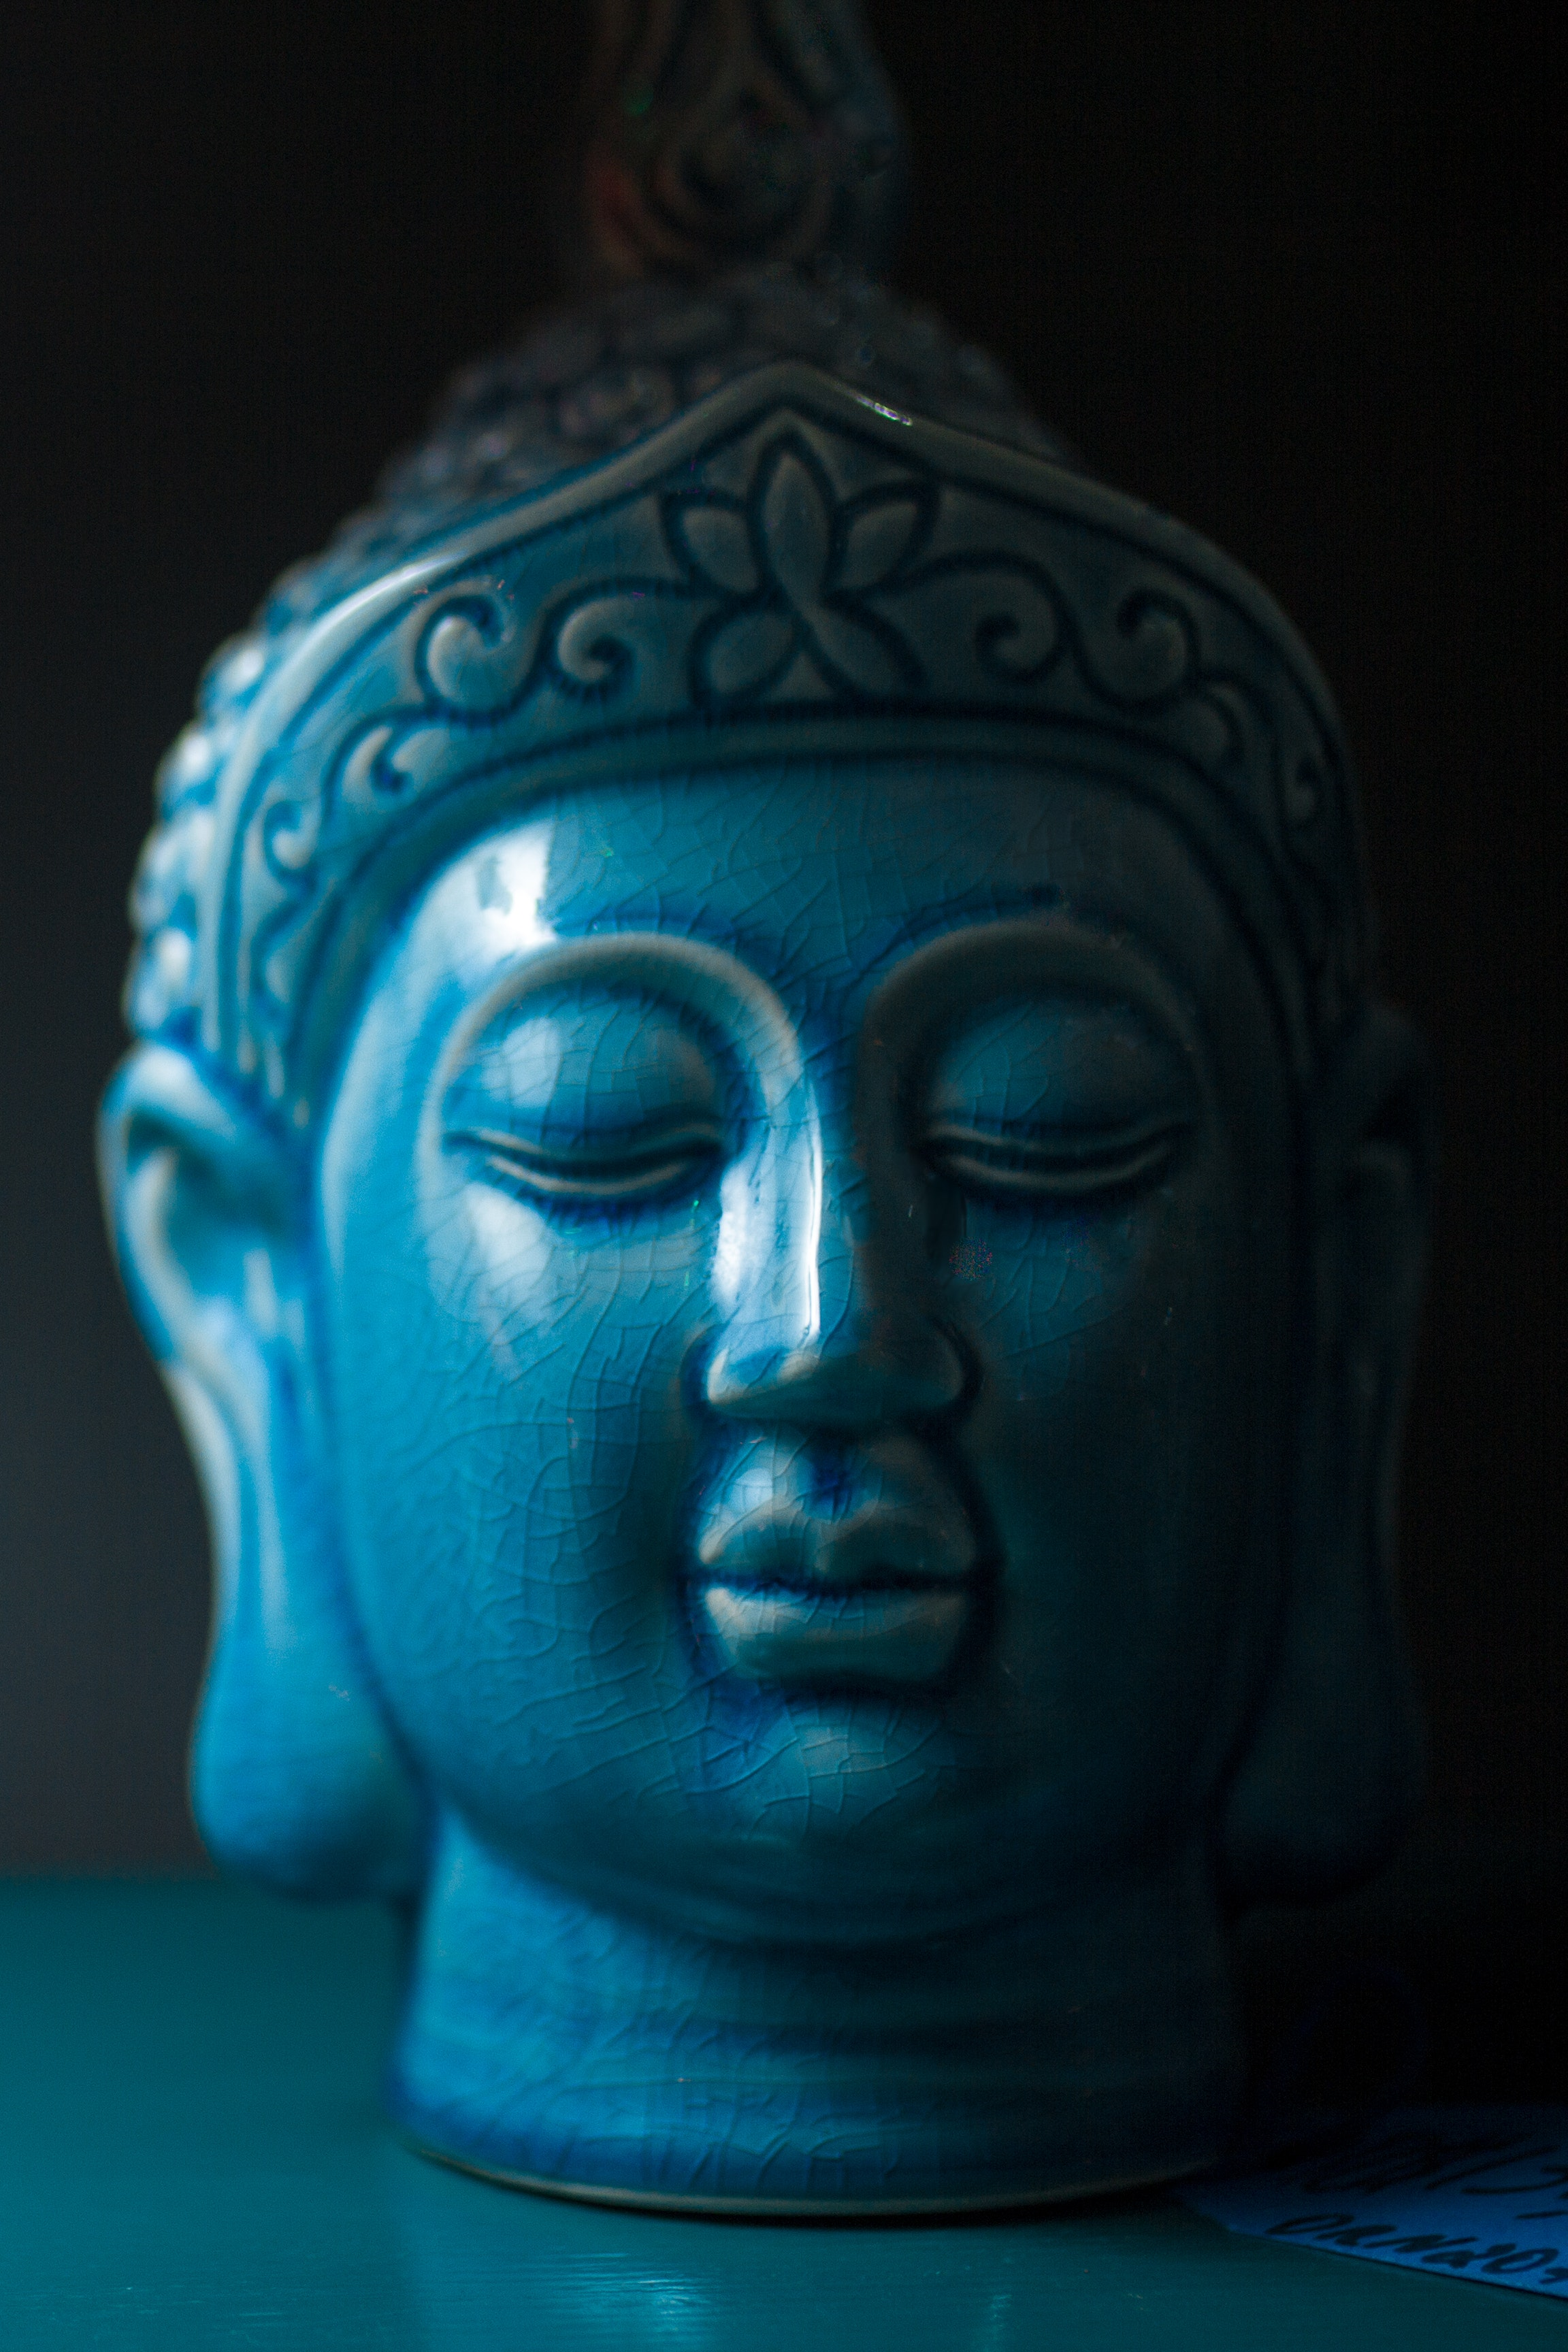 blue-buddha-ceramic-head-figurine-1597017